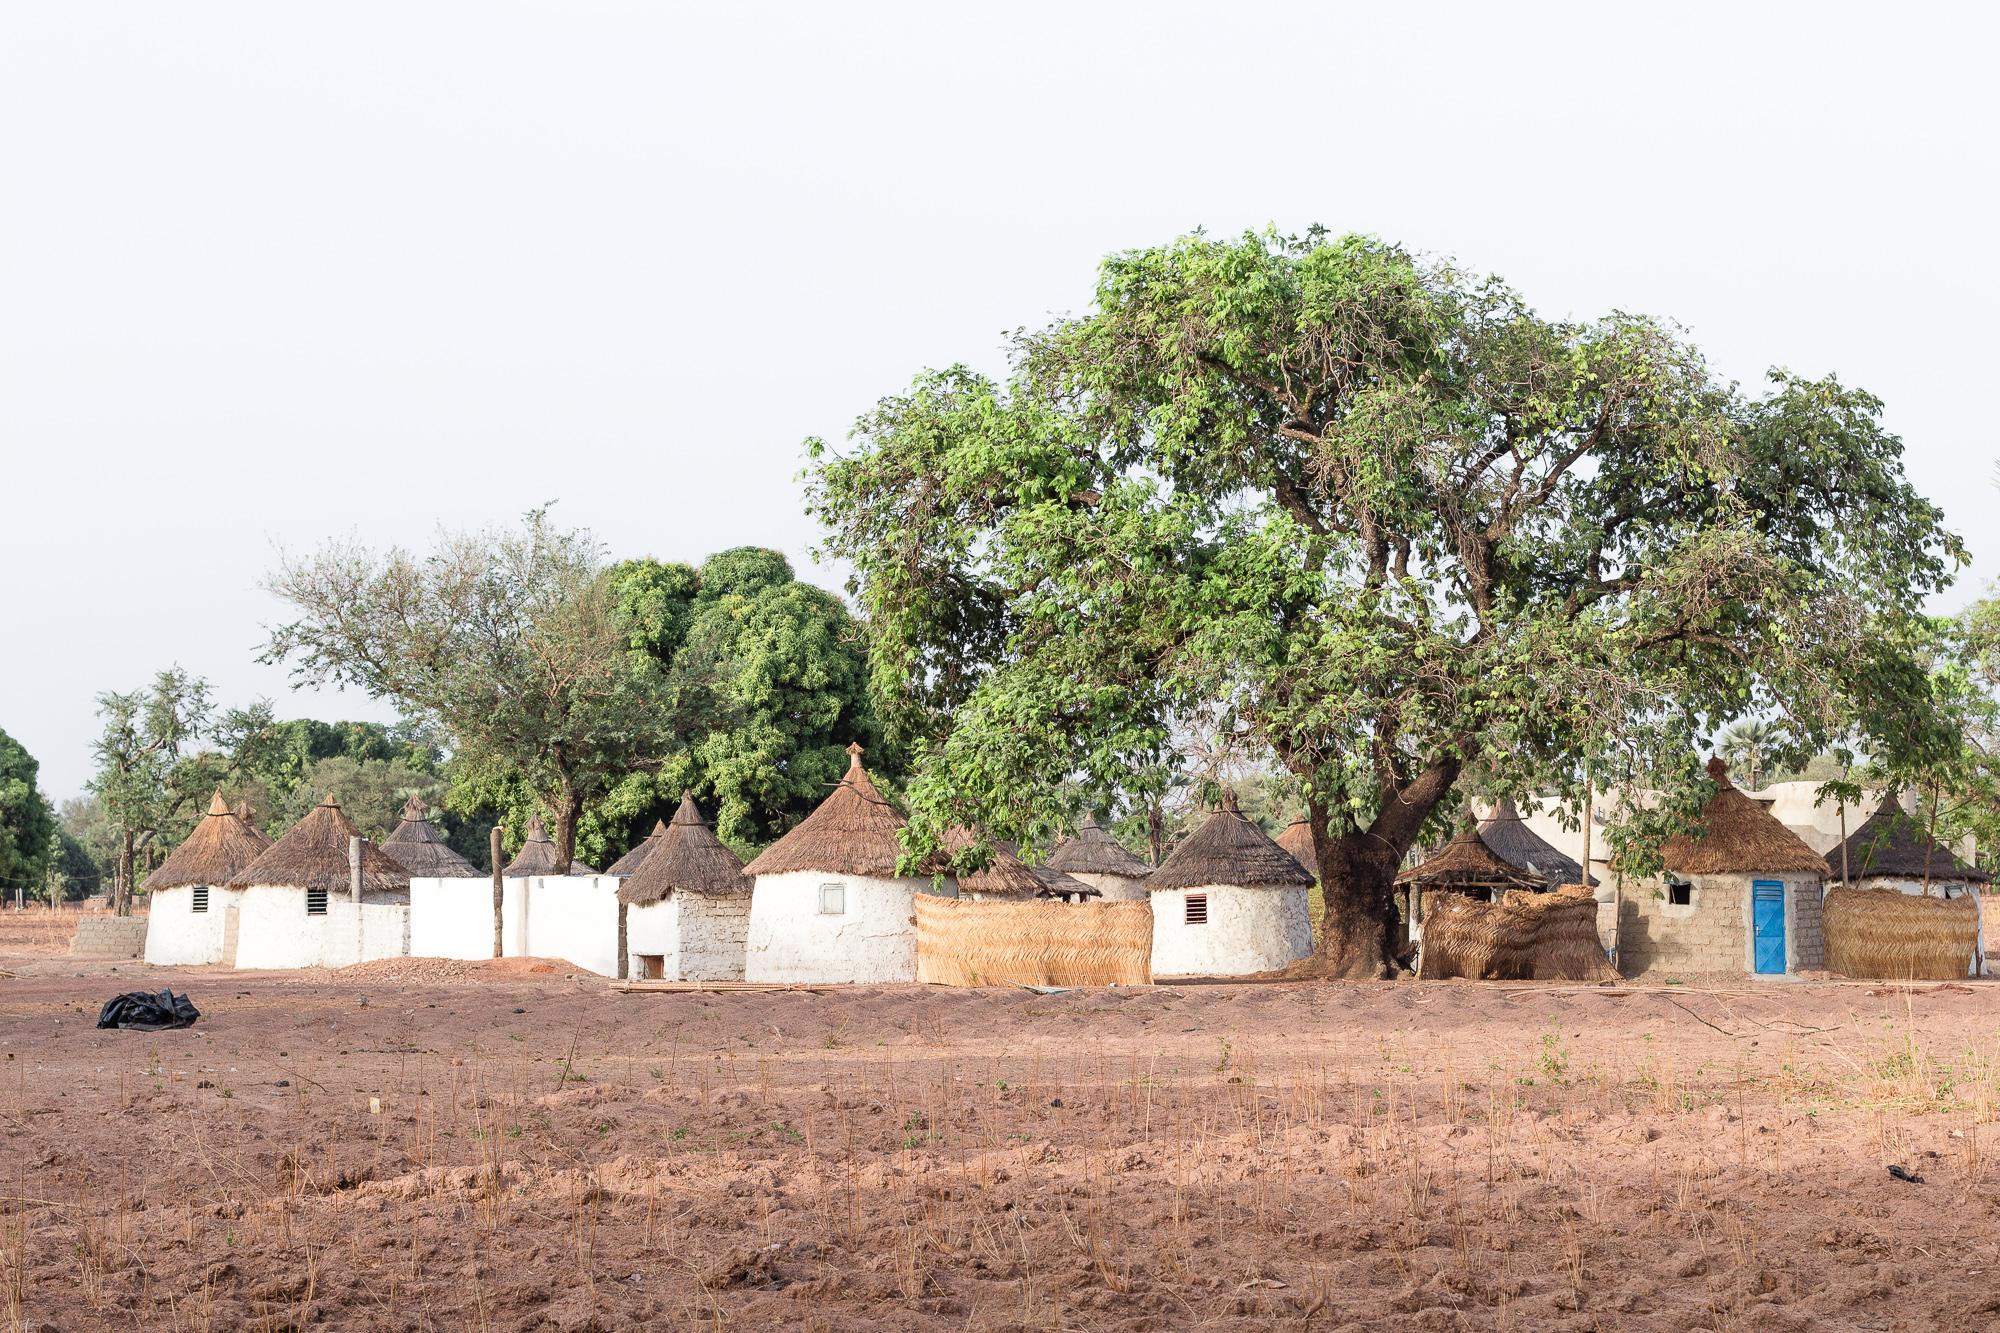 Village de cases de Tengrela, région de Banfora, Burkina Faso